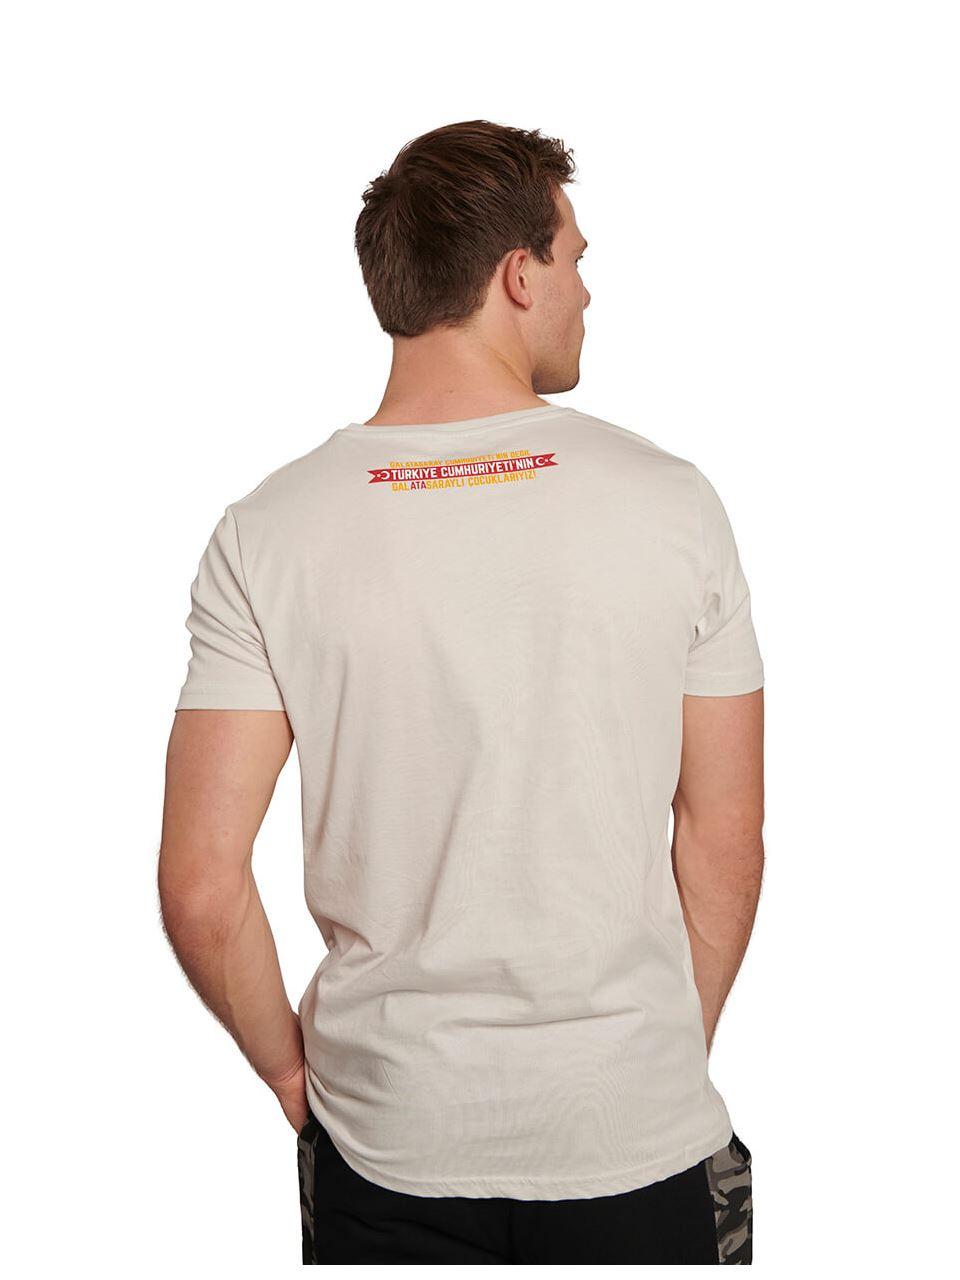 E90187 Ata T-shirt